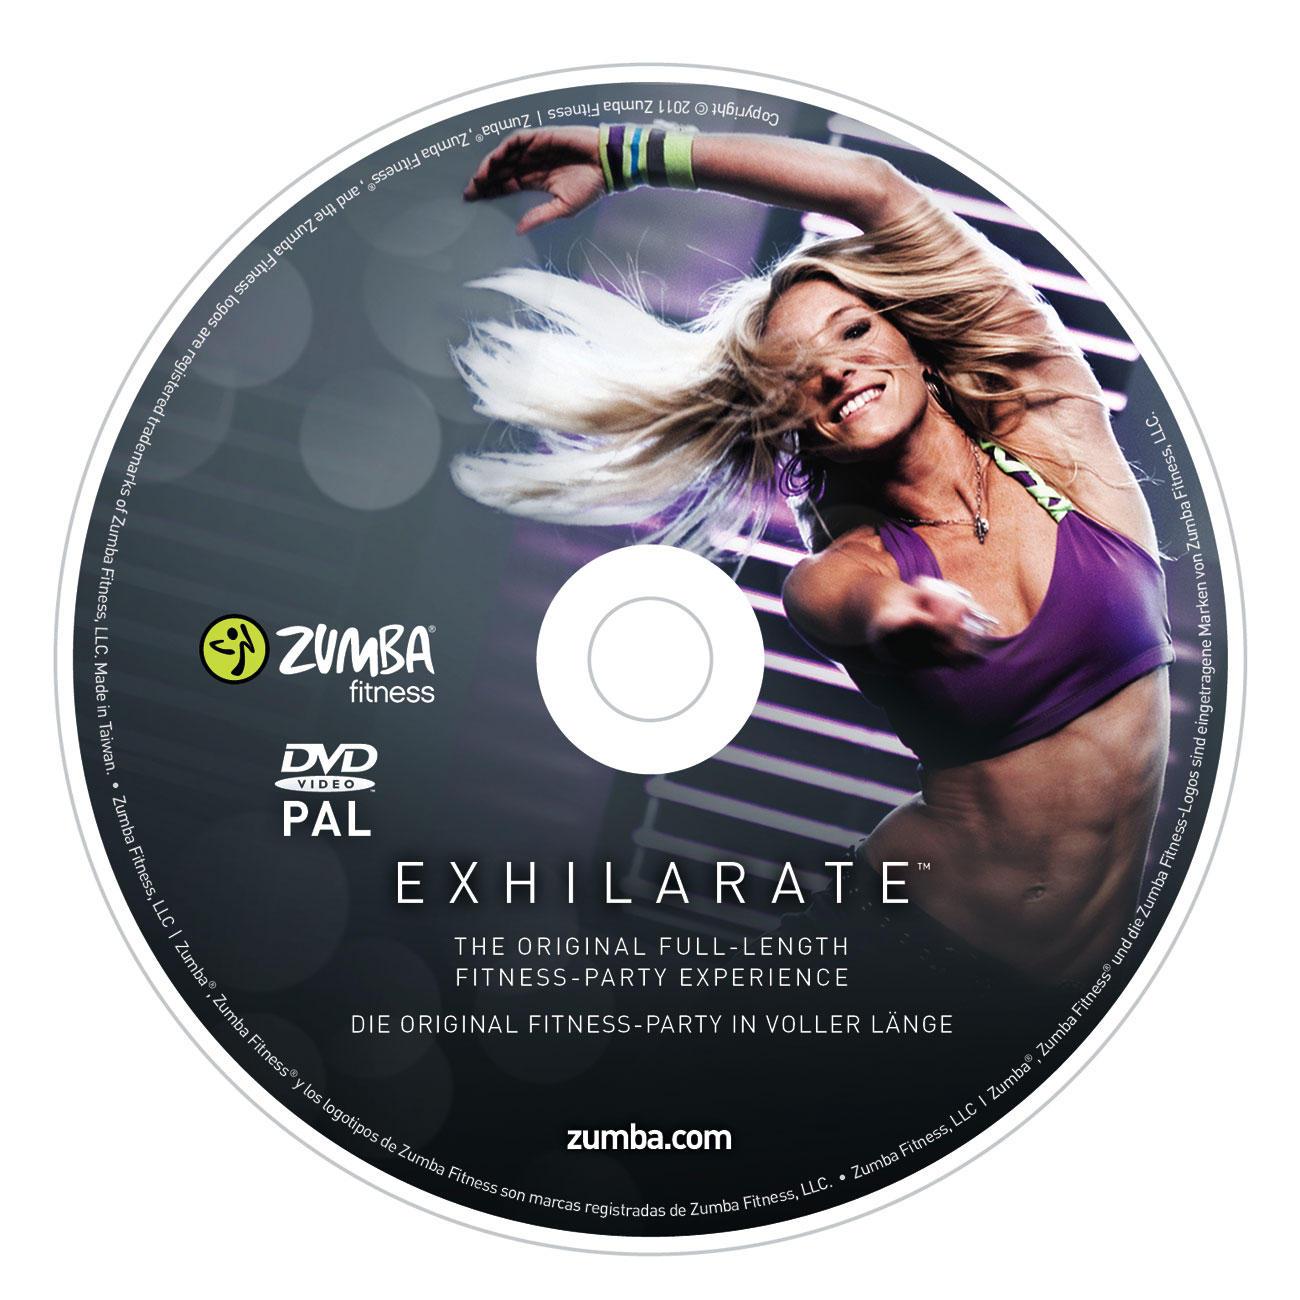 Zumba Fitness Live Dvd: Zumba® Fitness Exhilarate™ DVD-Programm Online Kaufen